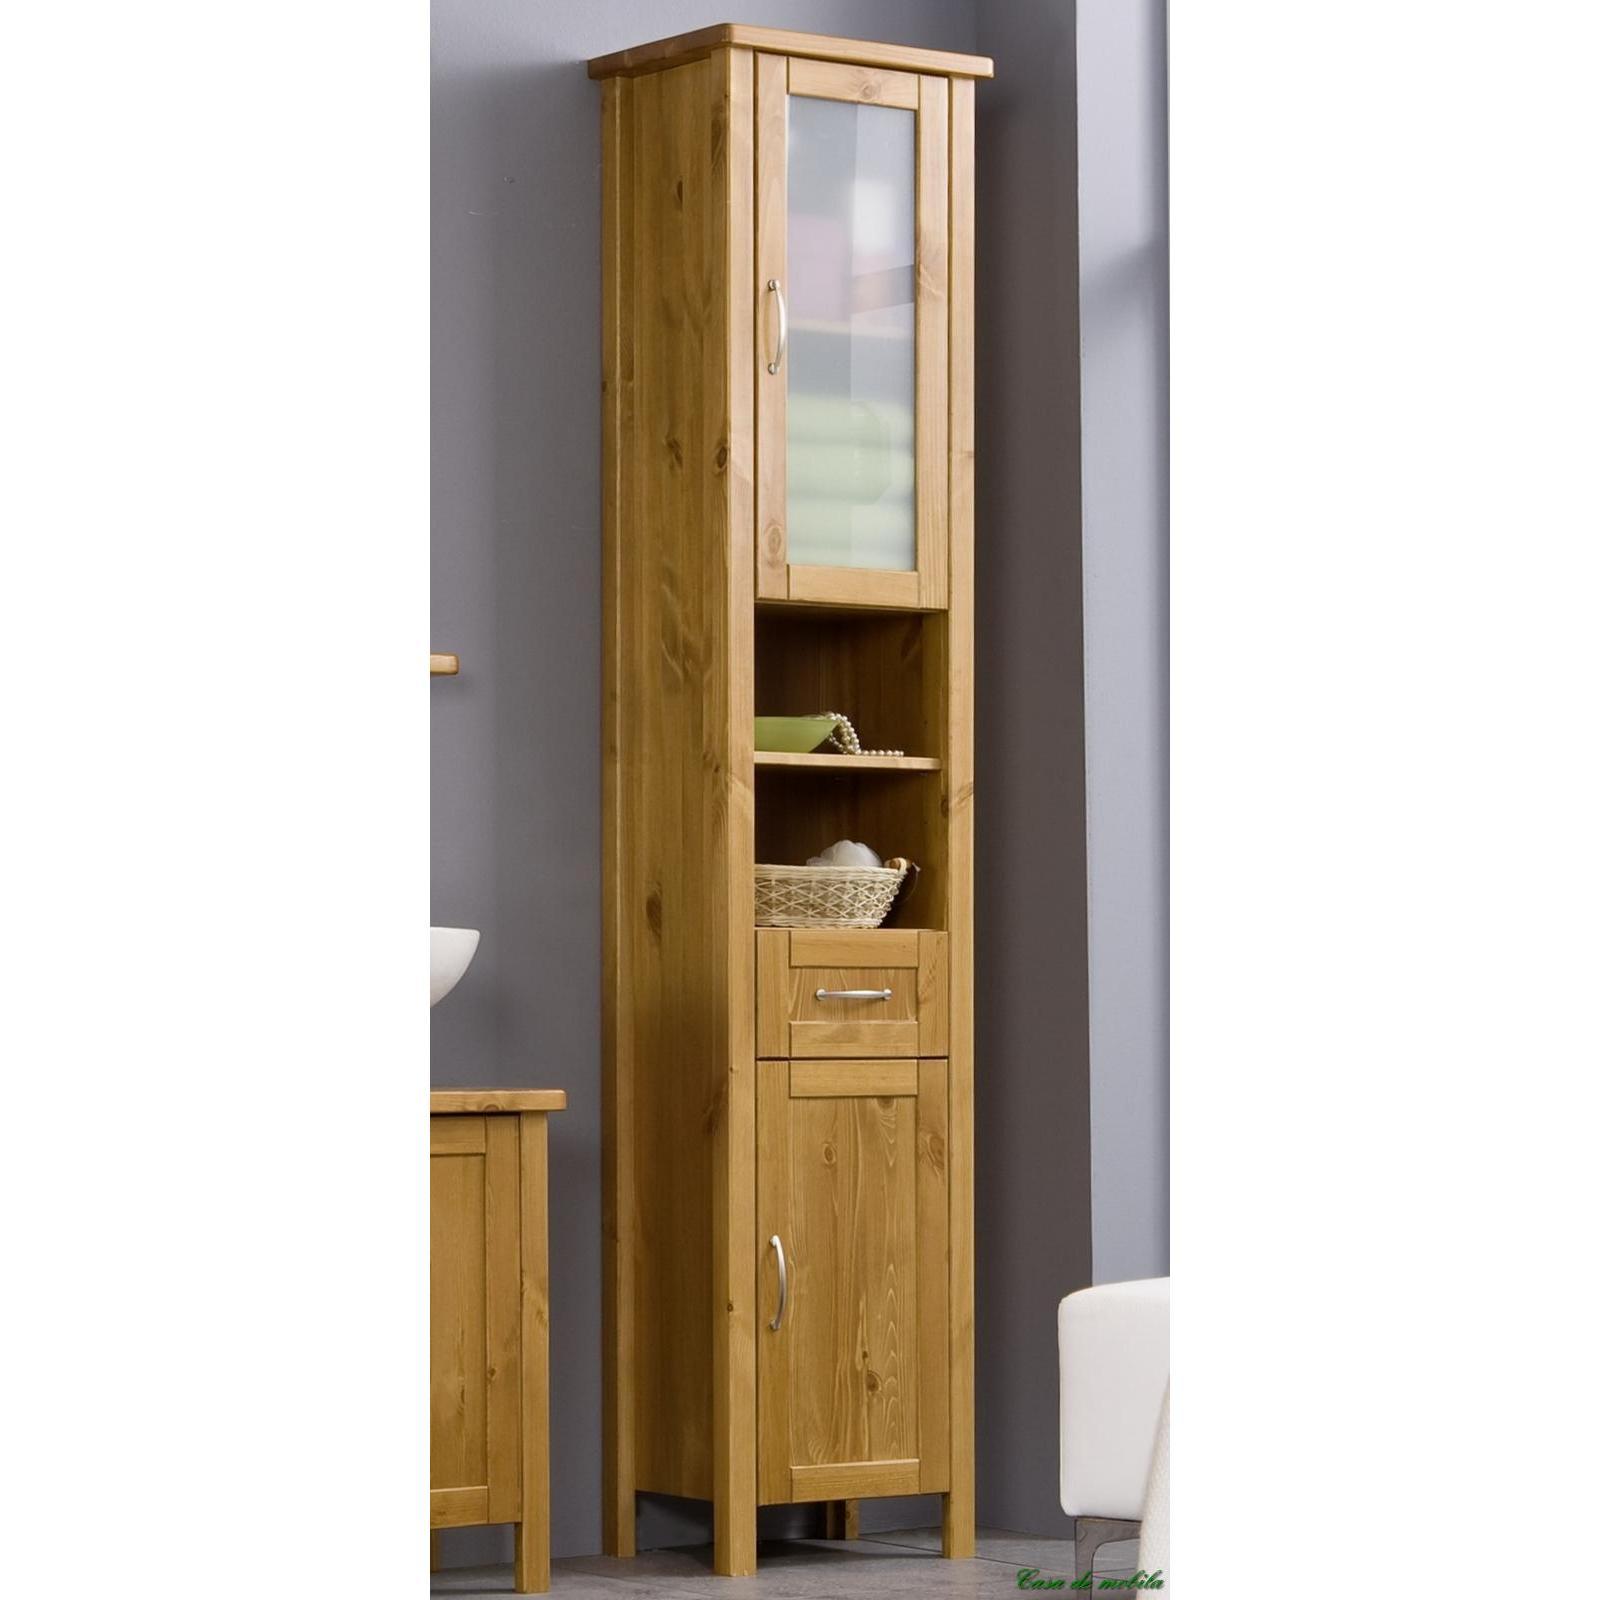 massivholz badm bel kiefer massiv set badezimmer komplett venedig honig lackiert ebay. Black Bedroom Furniture Sets. Home Design Ideas